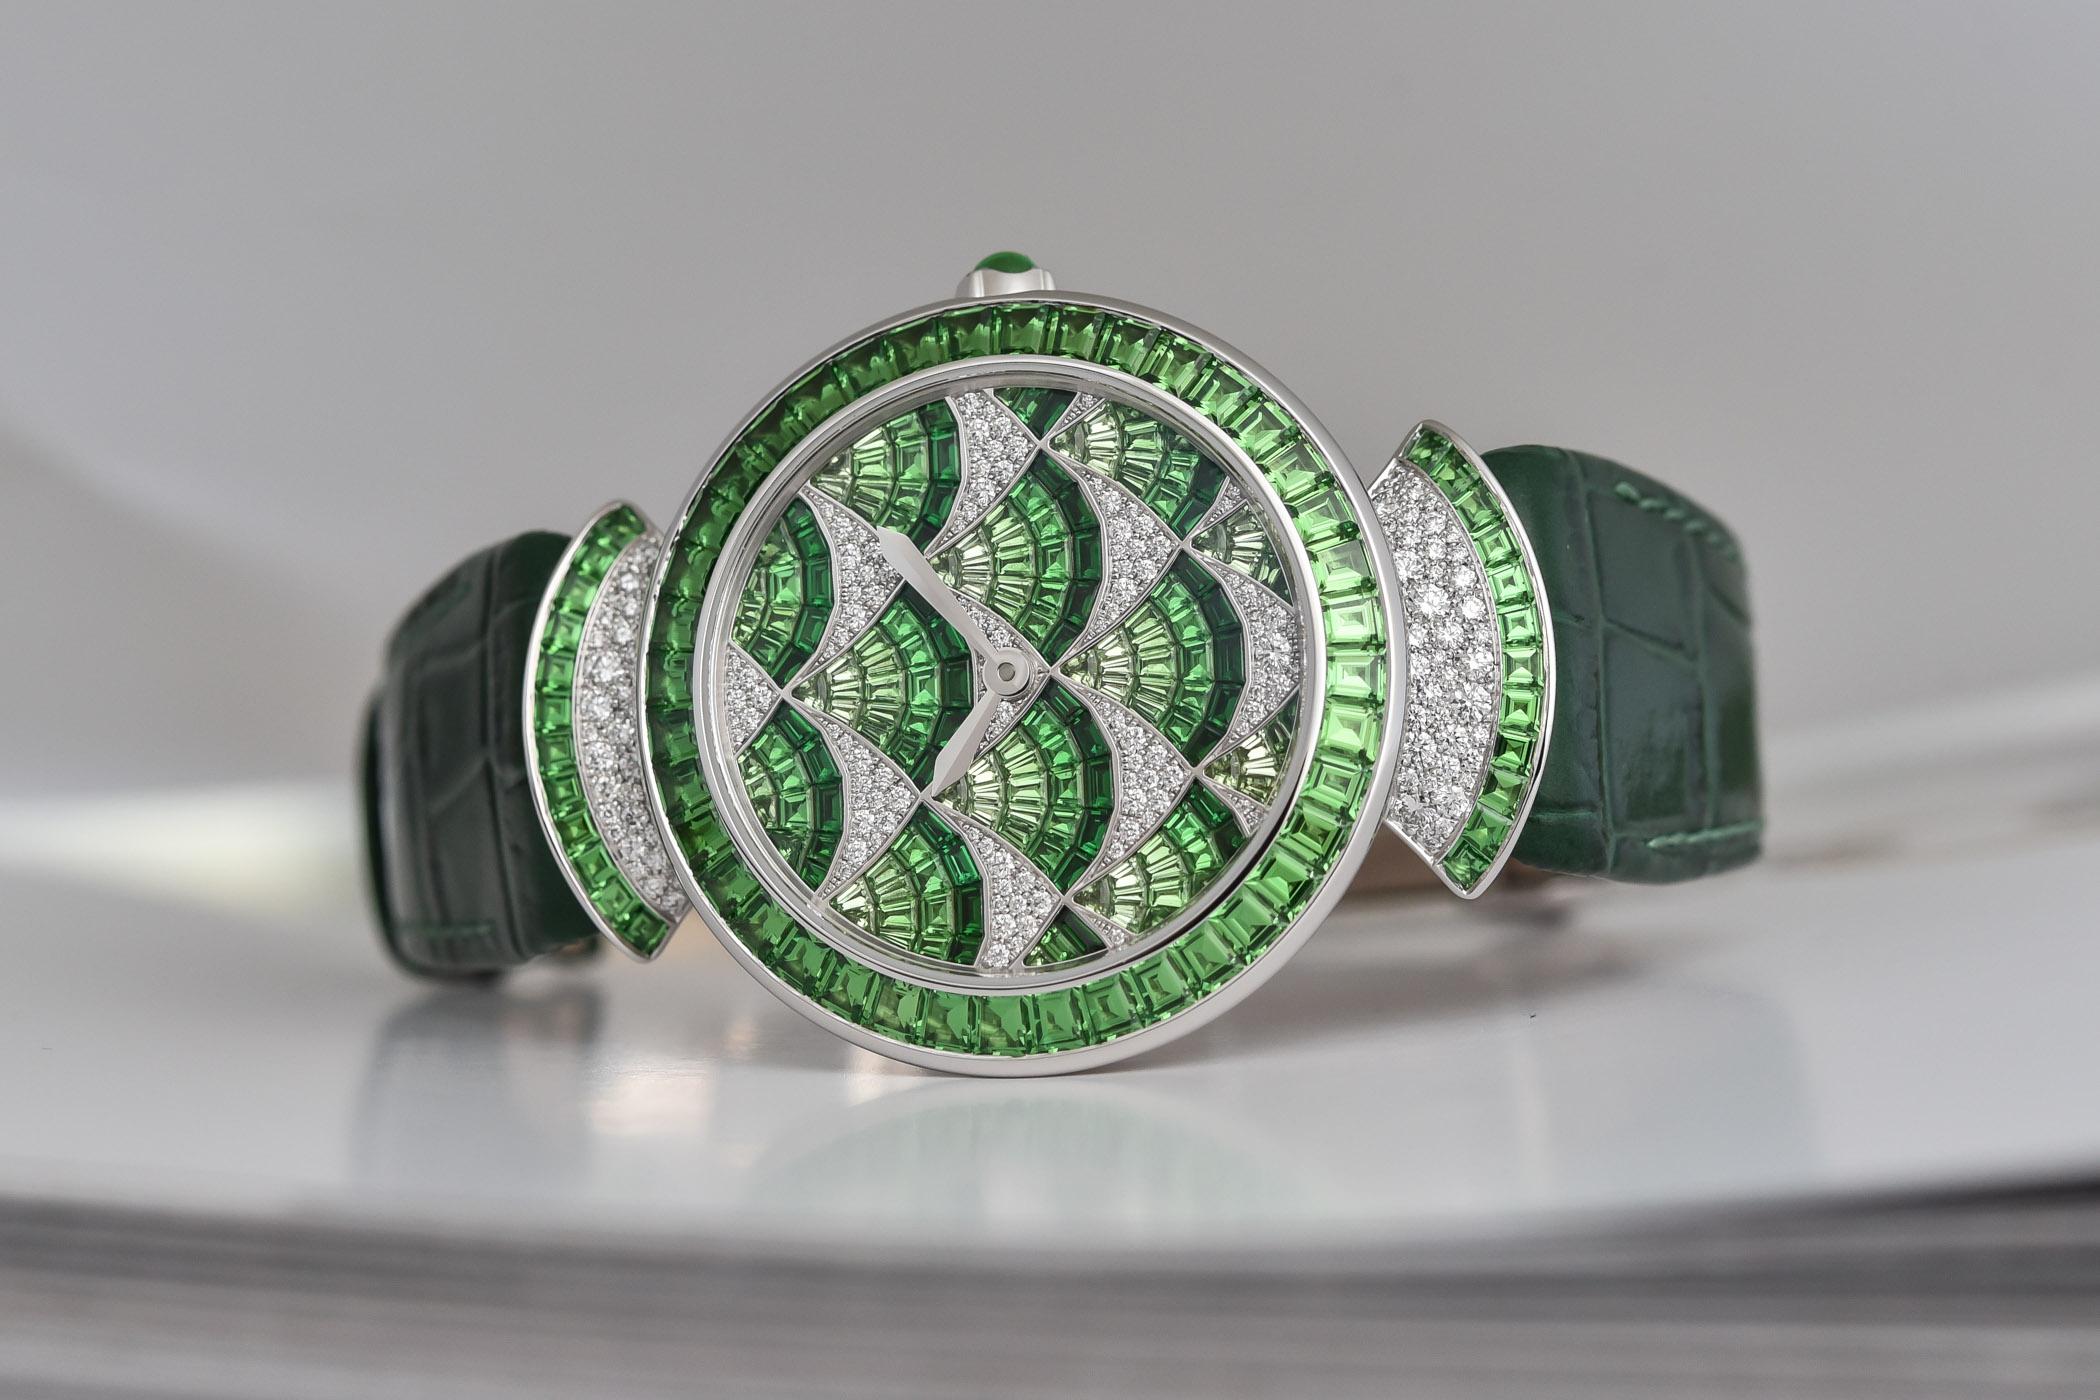 Bvlgari Divina Mosaica 2021 Collection